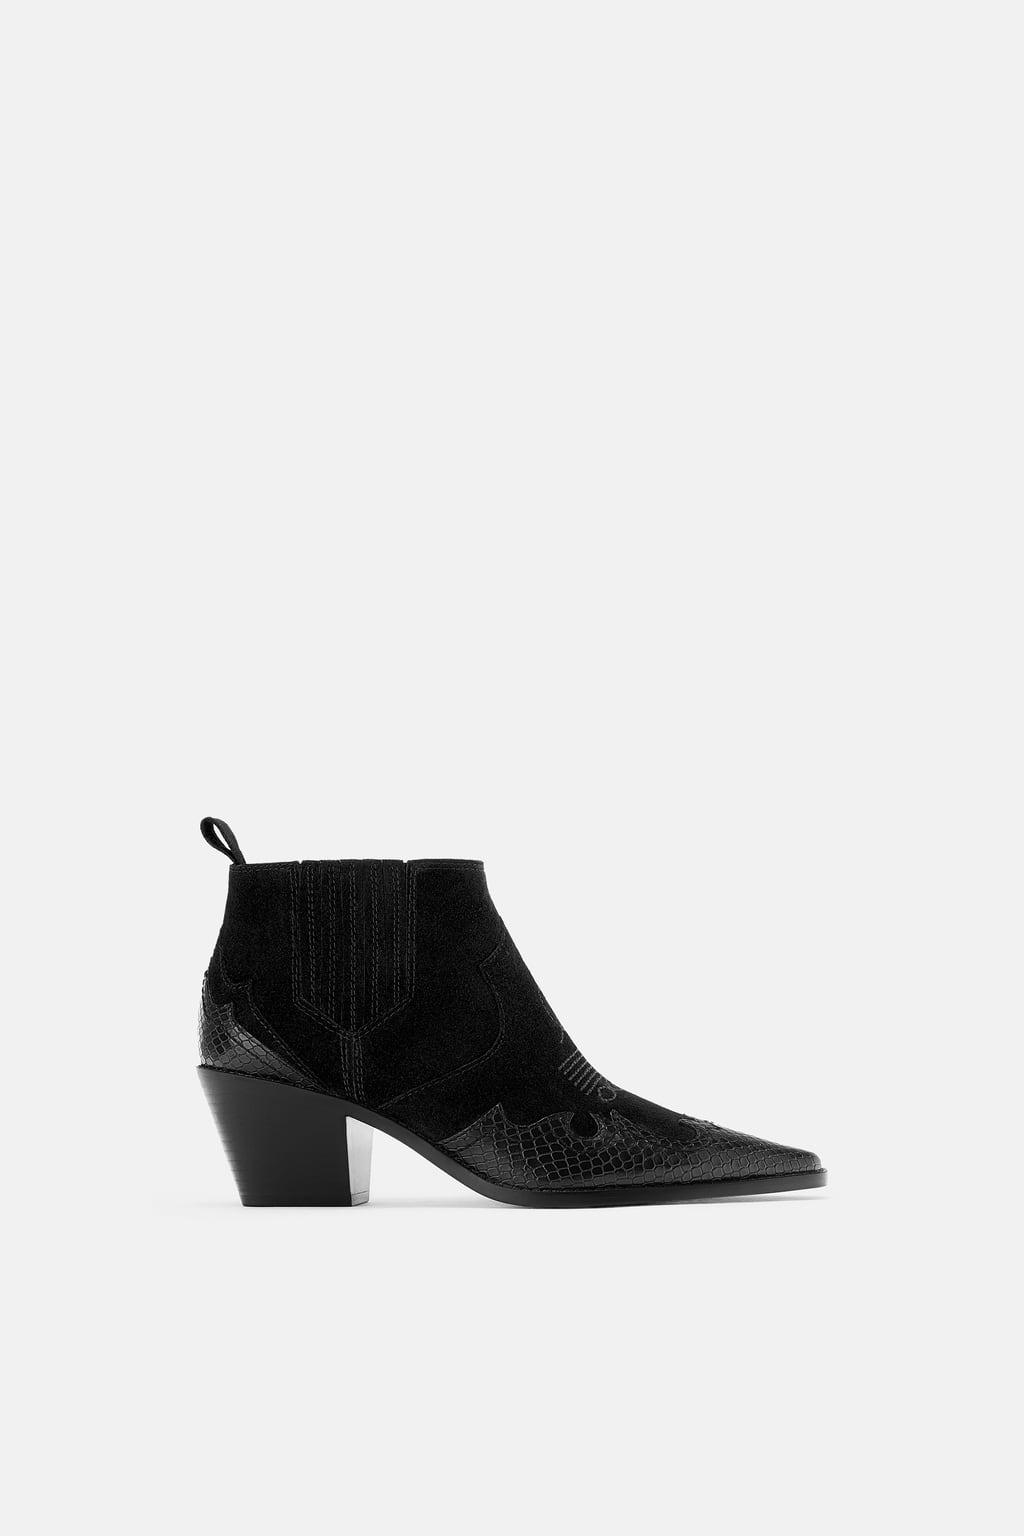 Zara Split Suede Cowboy Boots